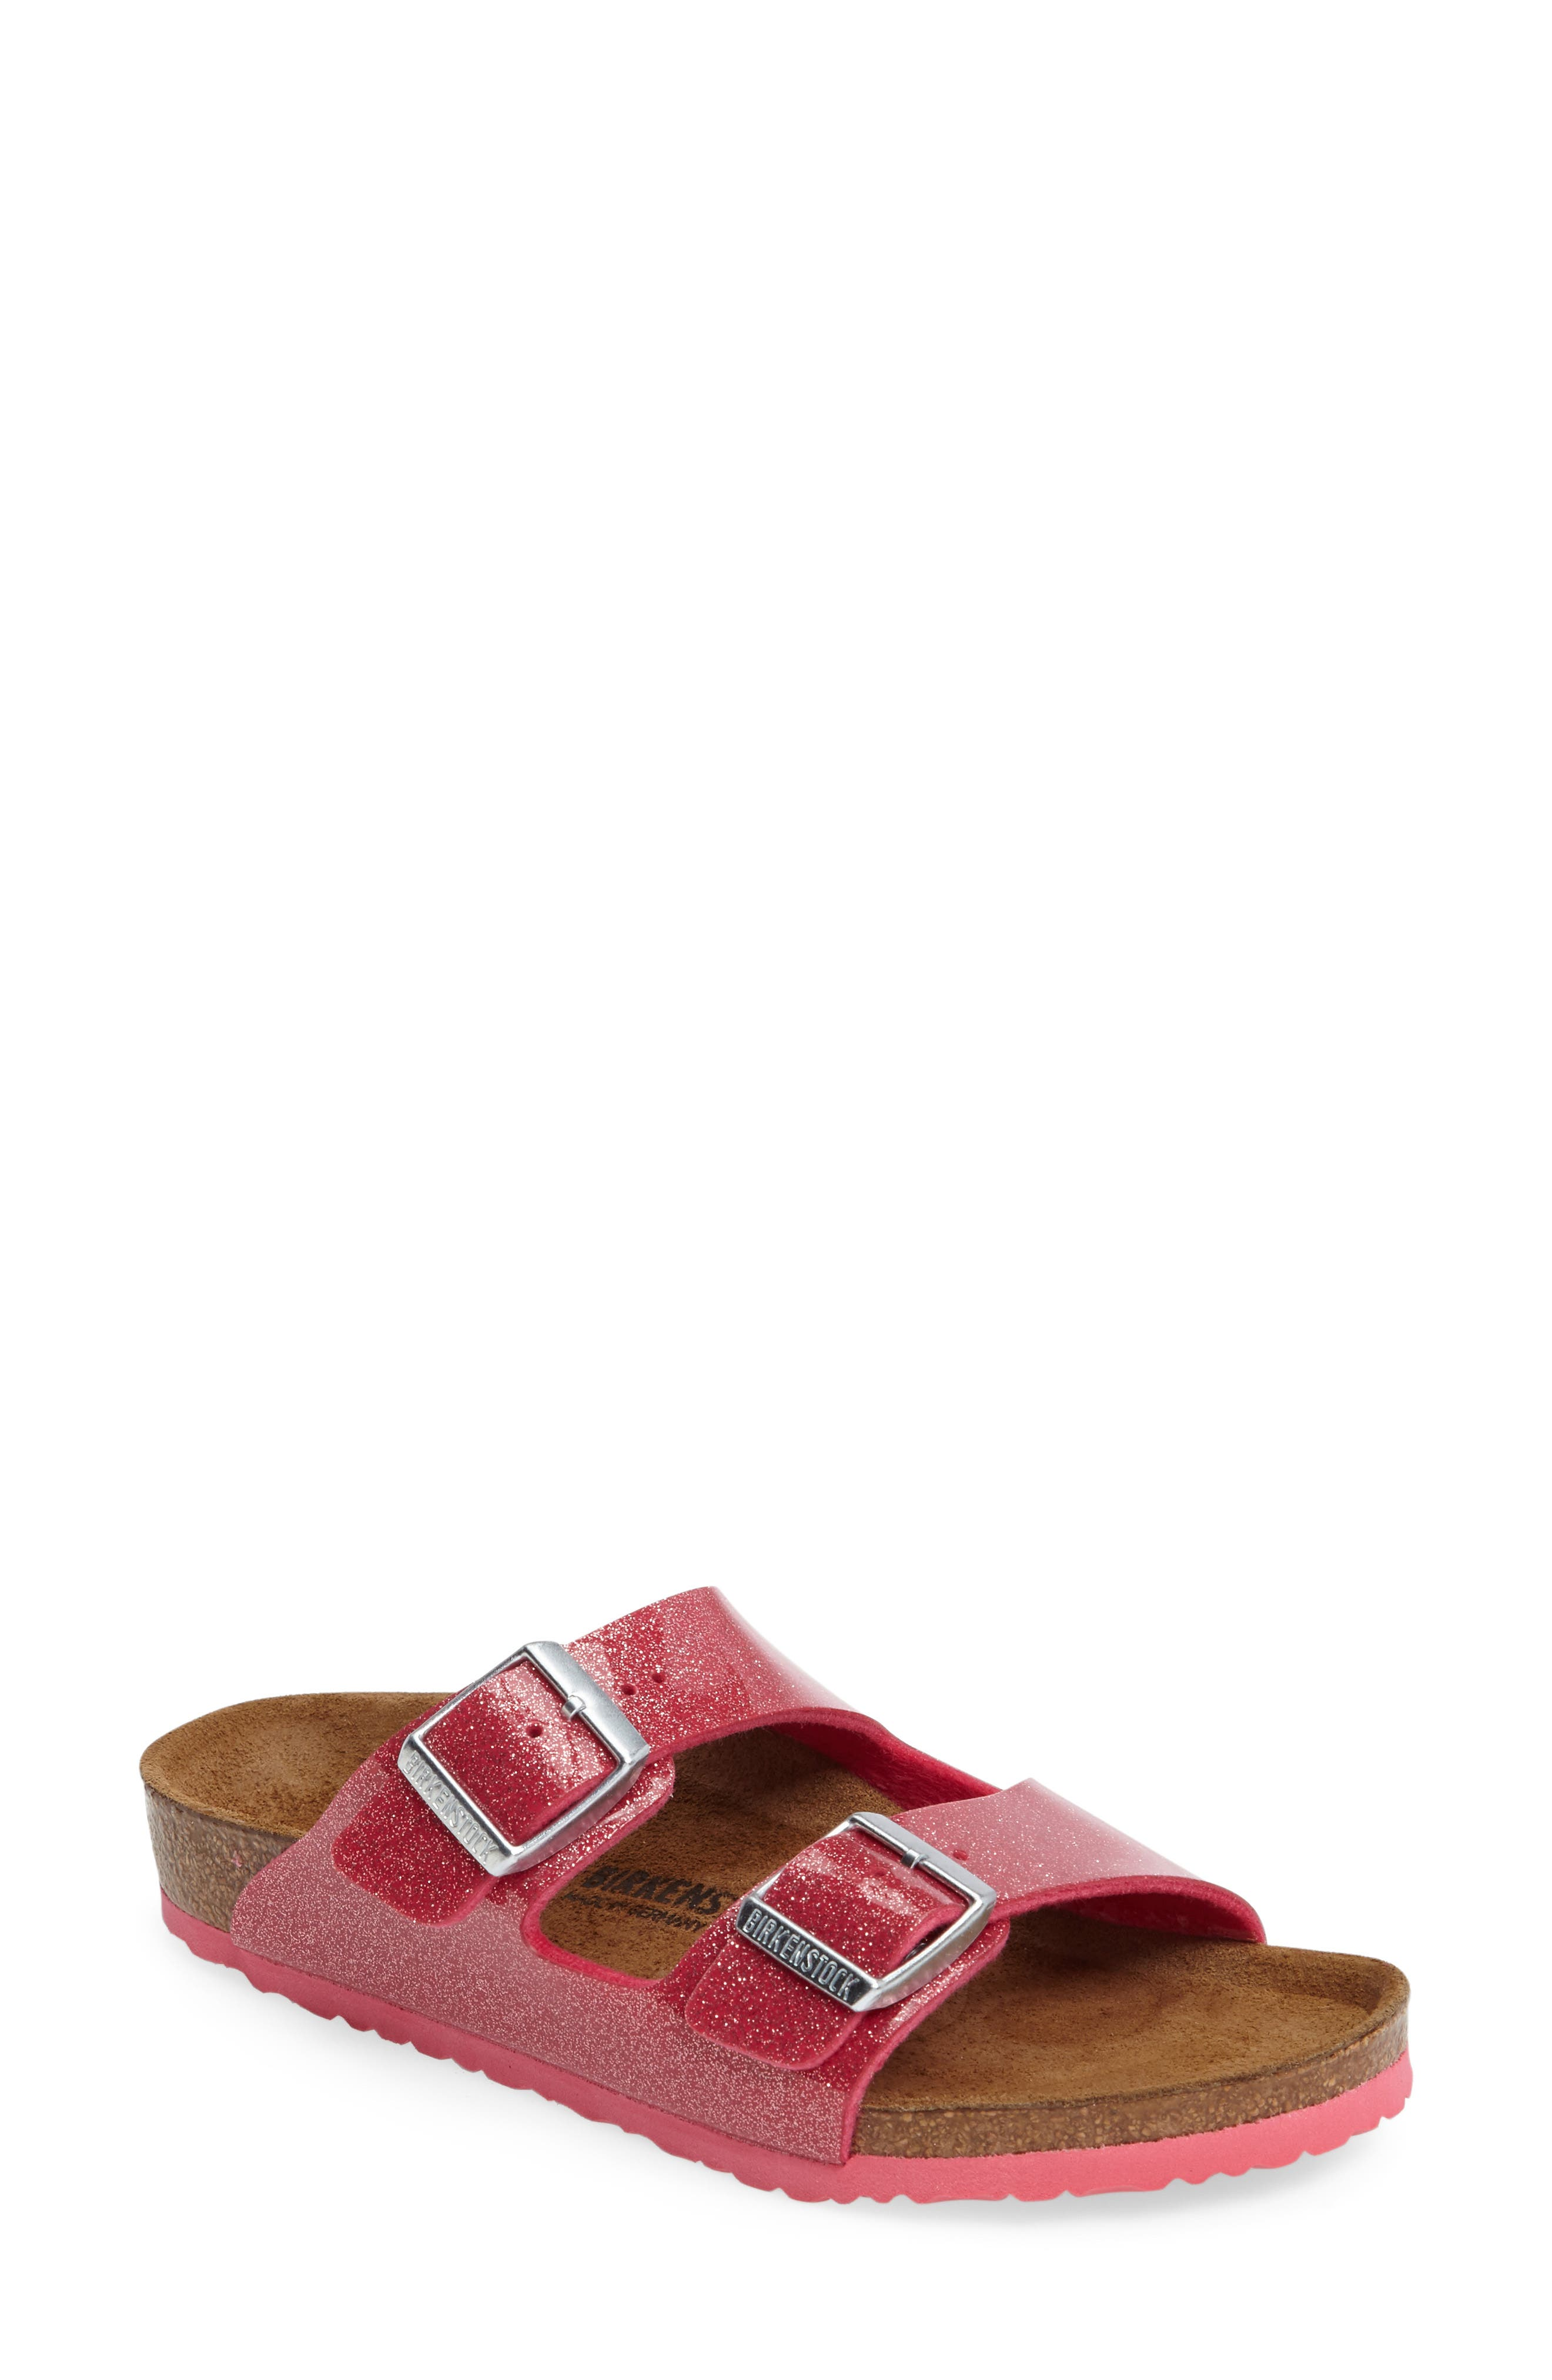 'Arizona Galaxy Birko-Flor' Slide Sandal,                             Main thumbnail 4, color,